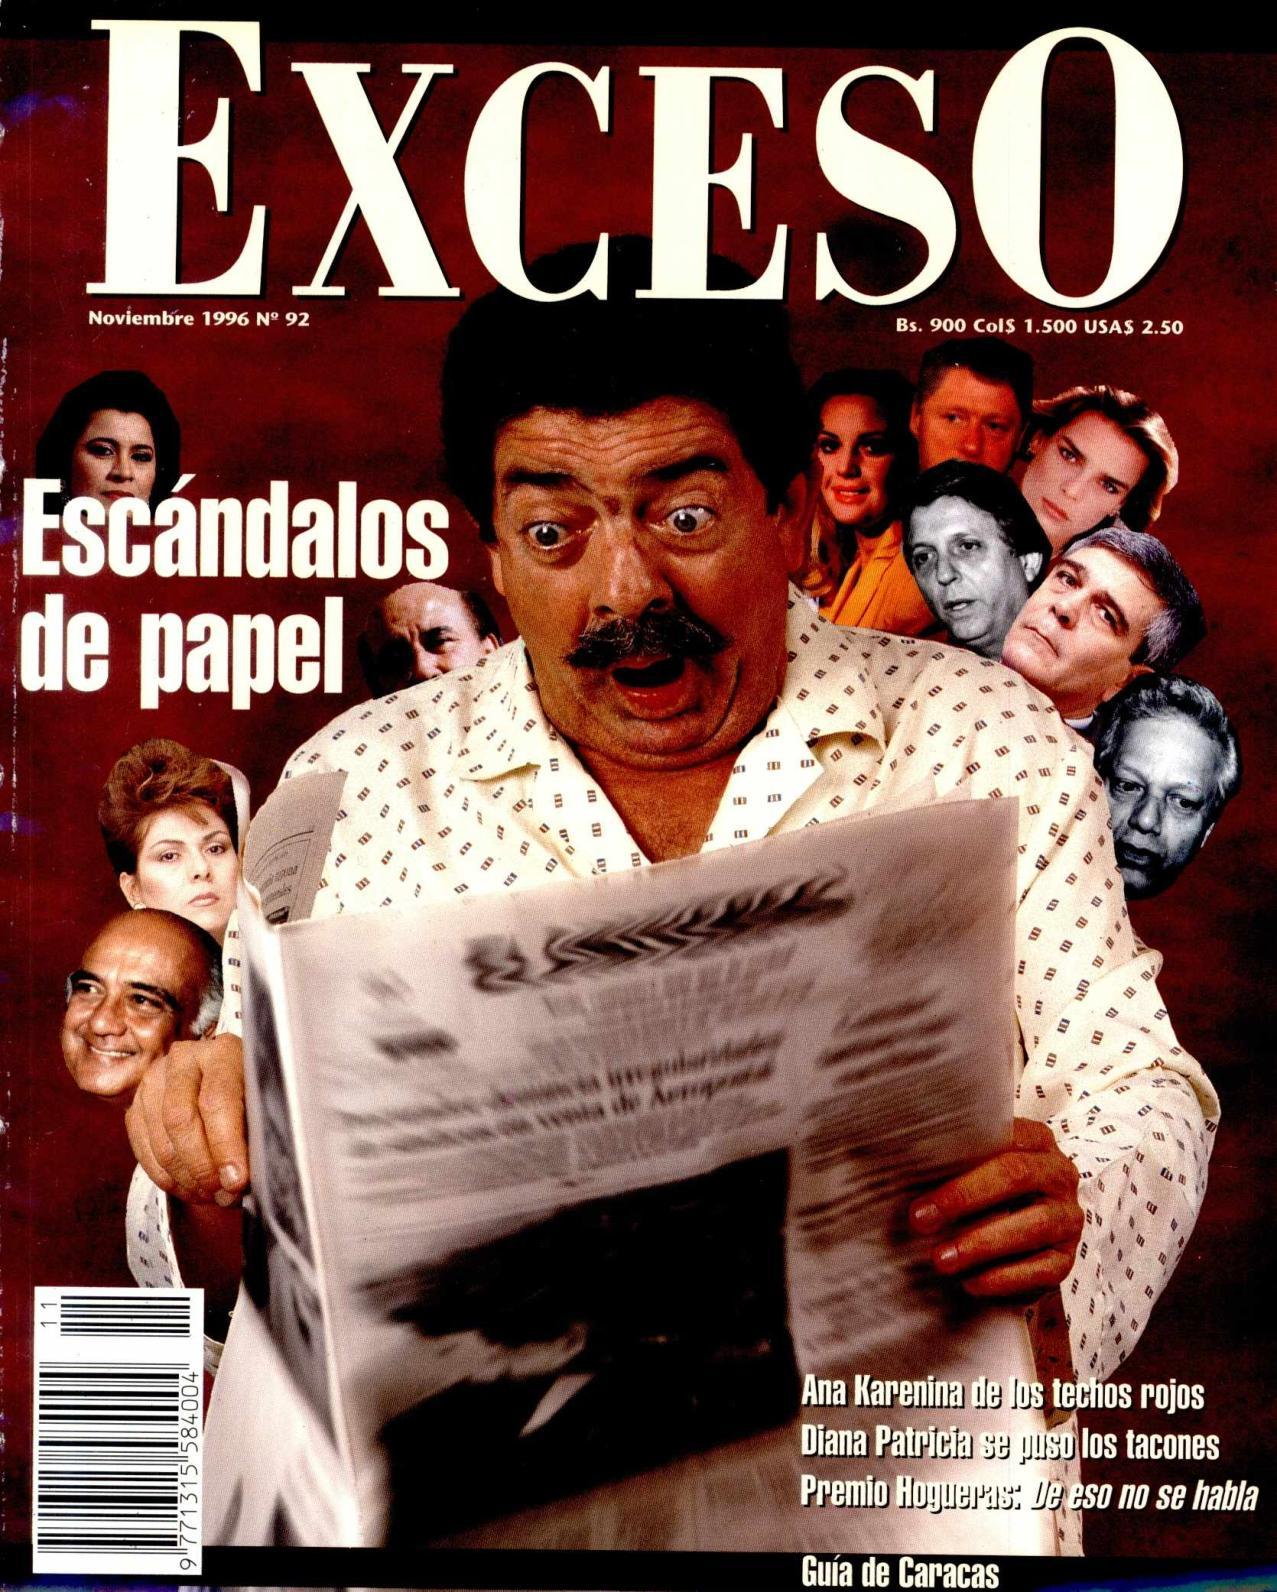 Calaméo - REVISTA EXCESO NOVIEMBRE 1996 Nº 92